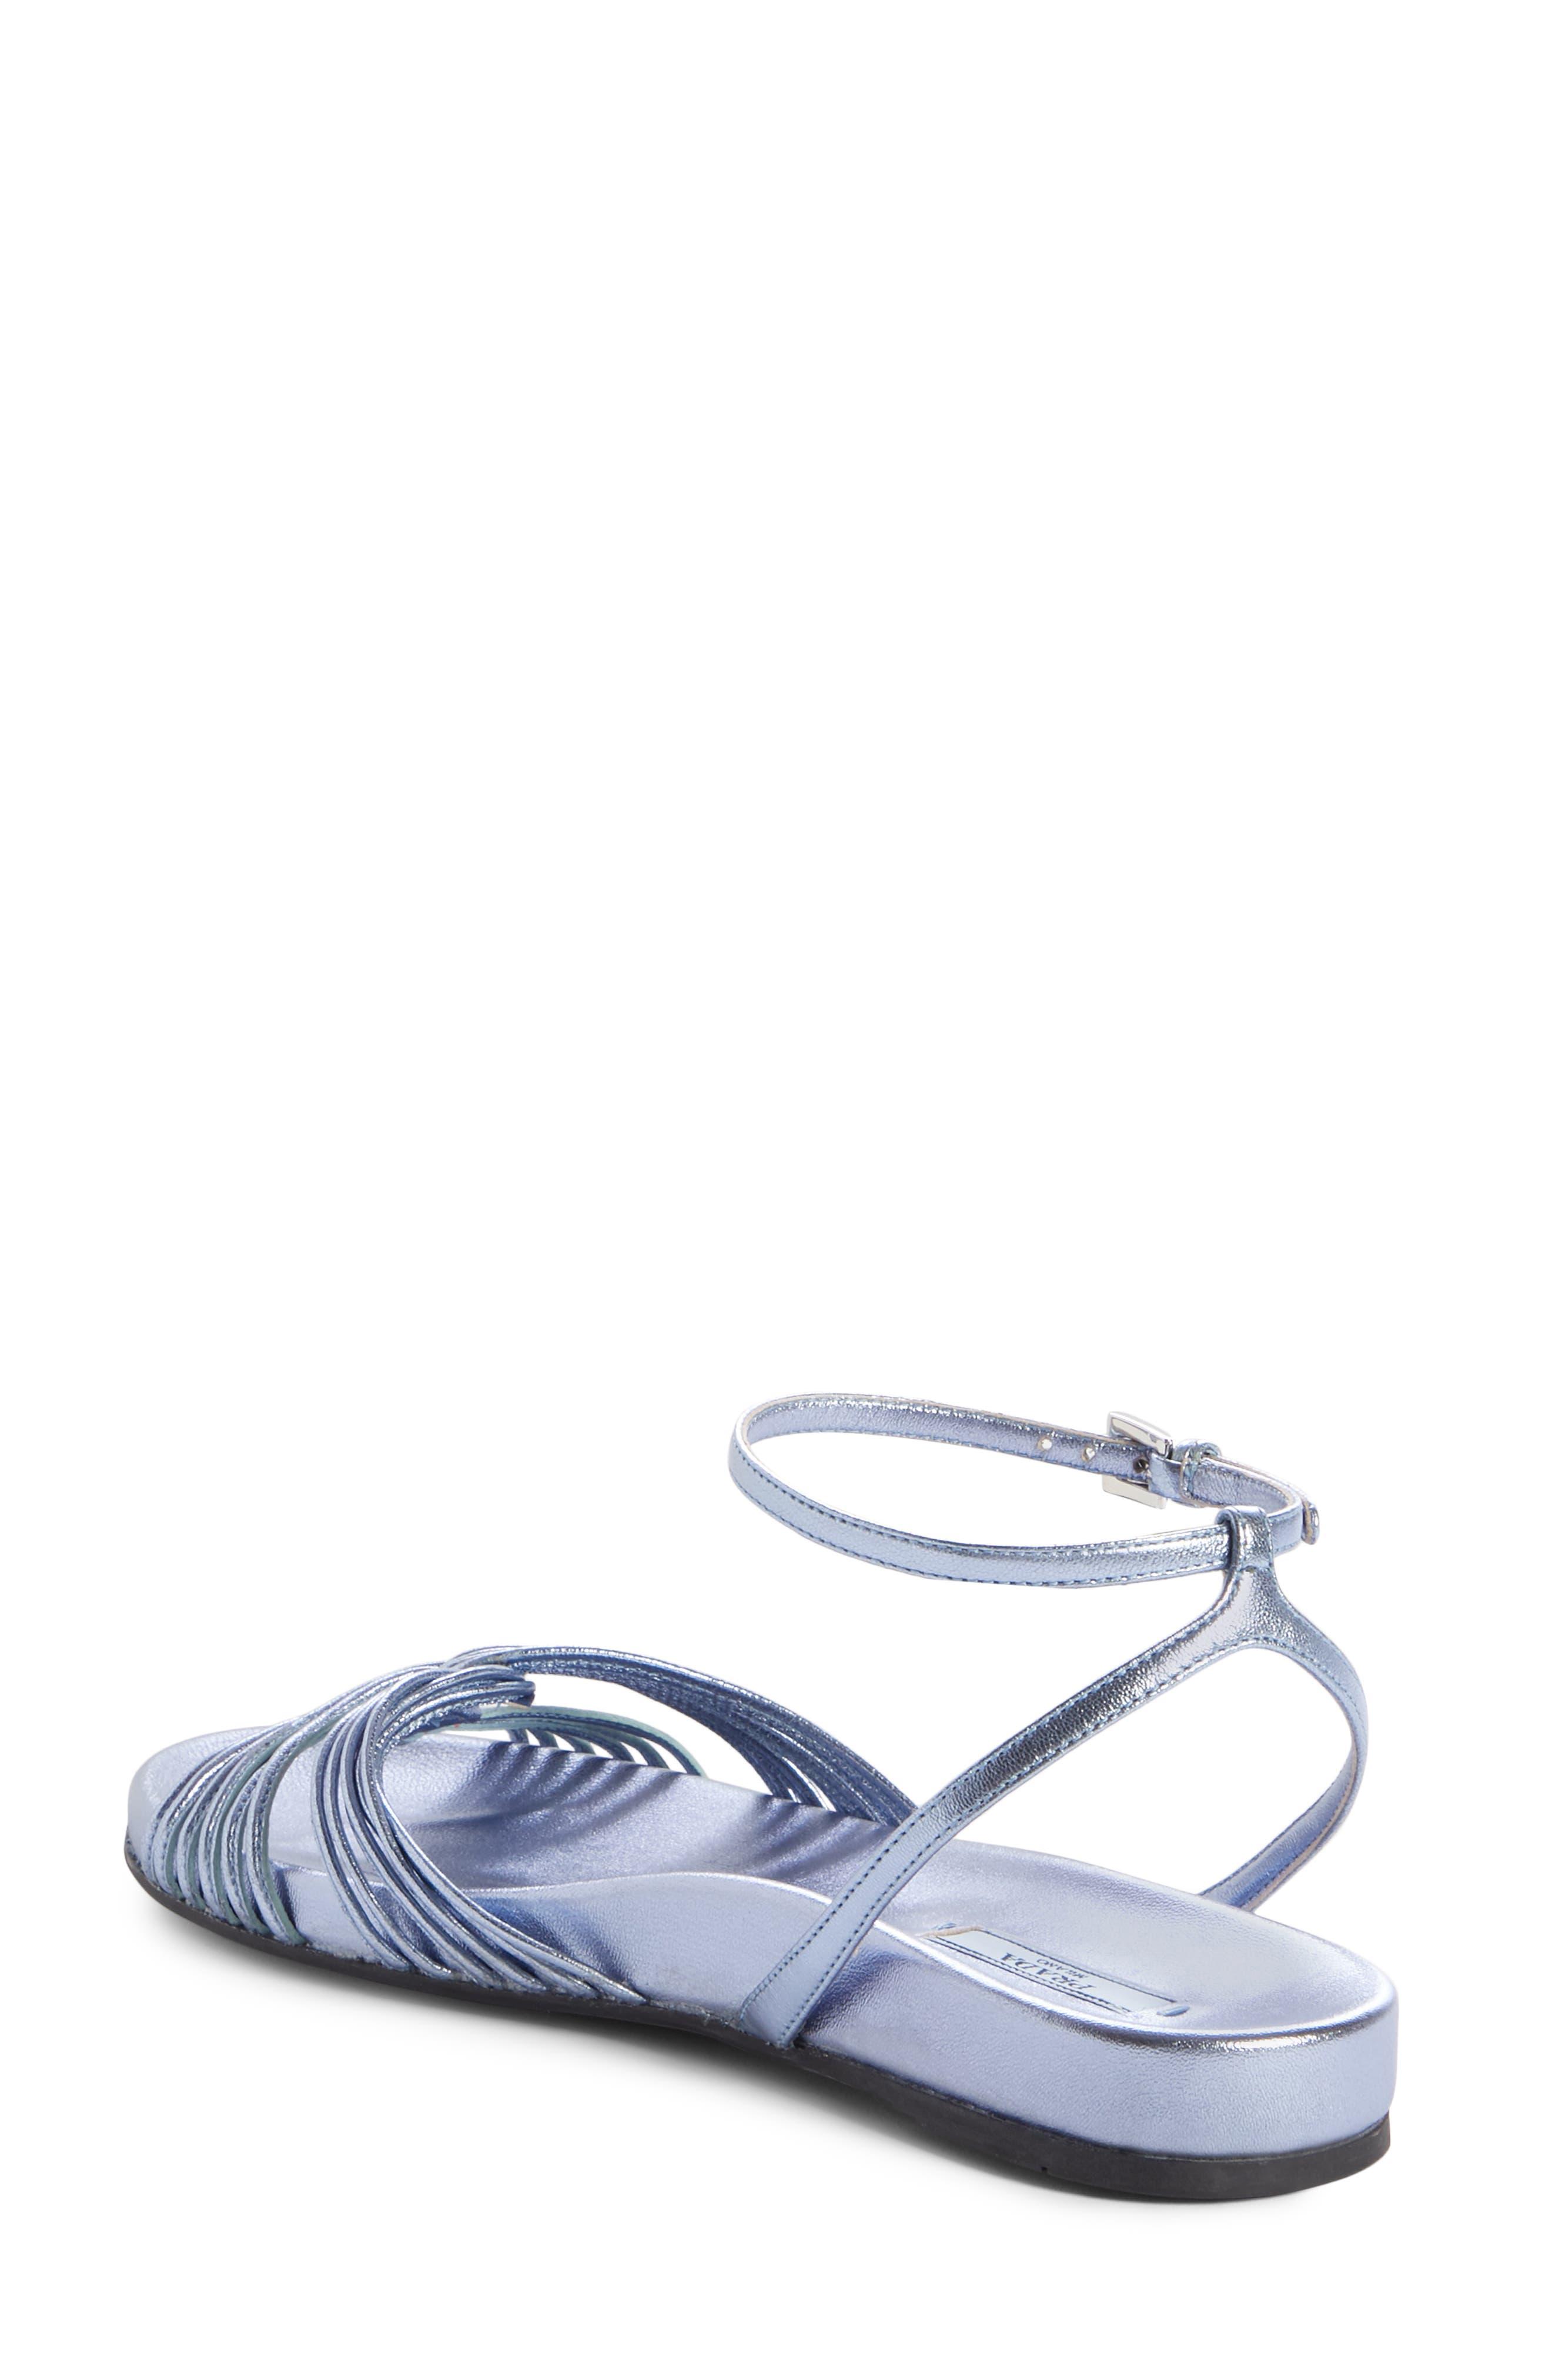 Roping Sandal,                             Alternate thumbnail 2, color,                             BLUE LEATHER